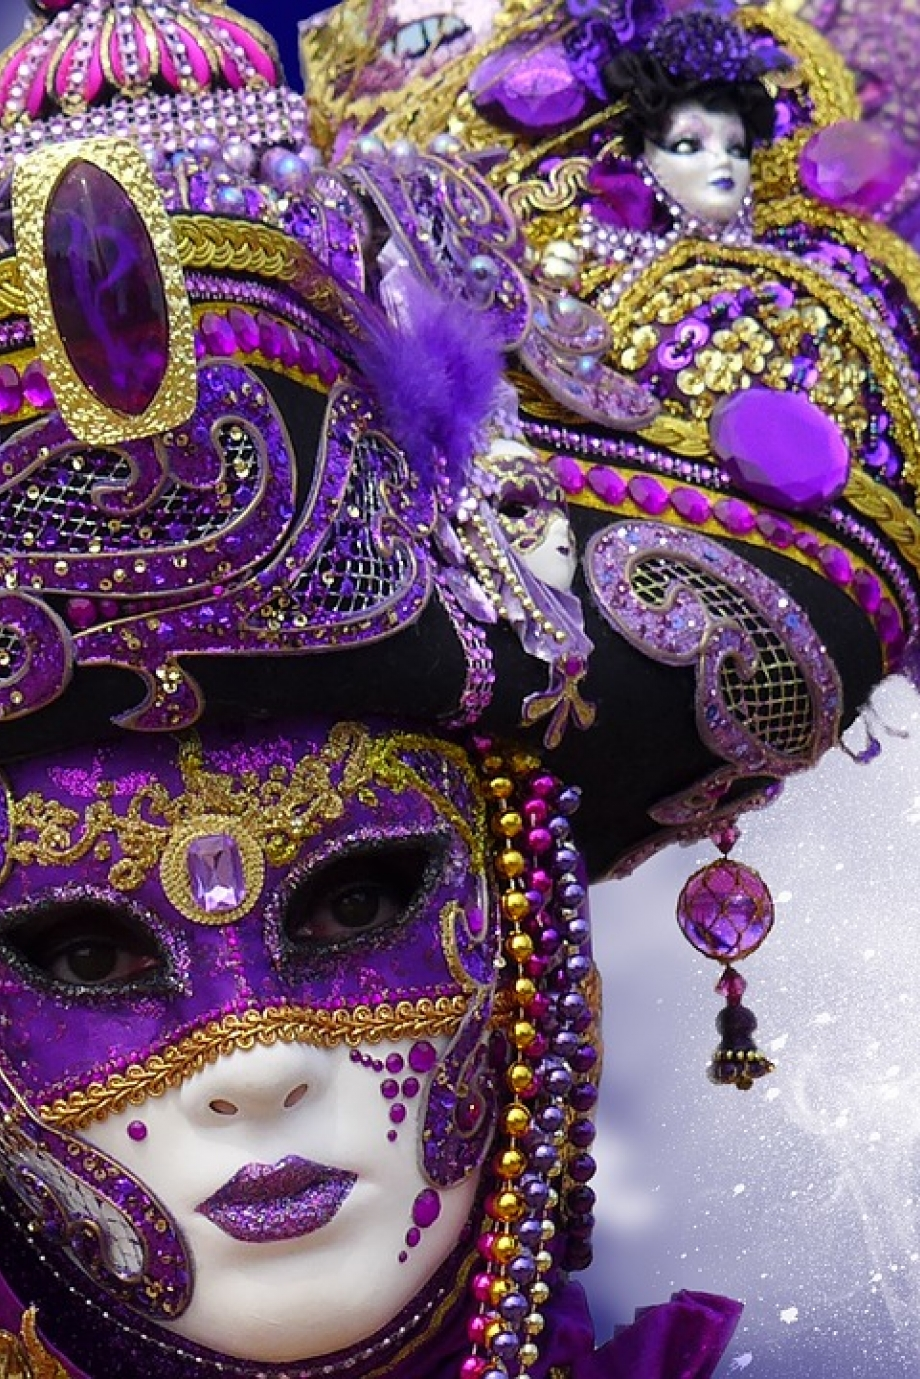 PortoCool_Blog_Aqui Perto: Carnaval no Vidago Palace